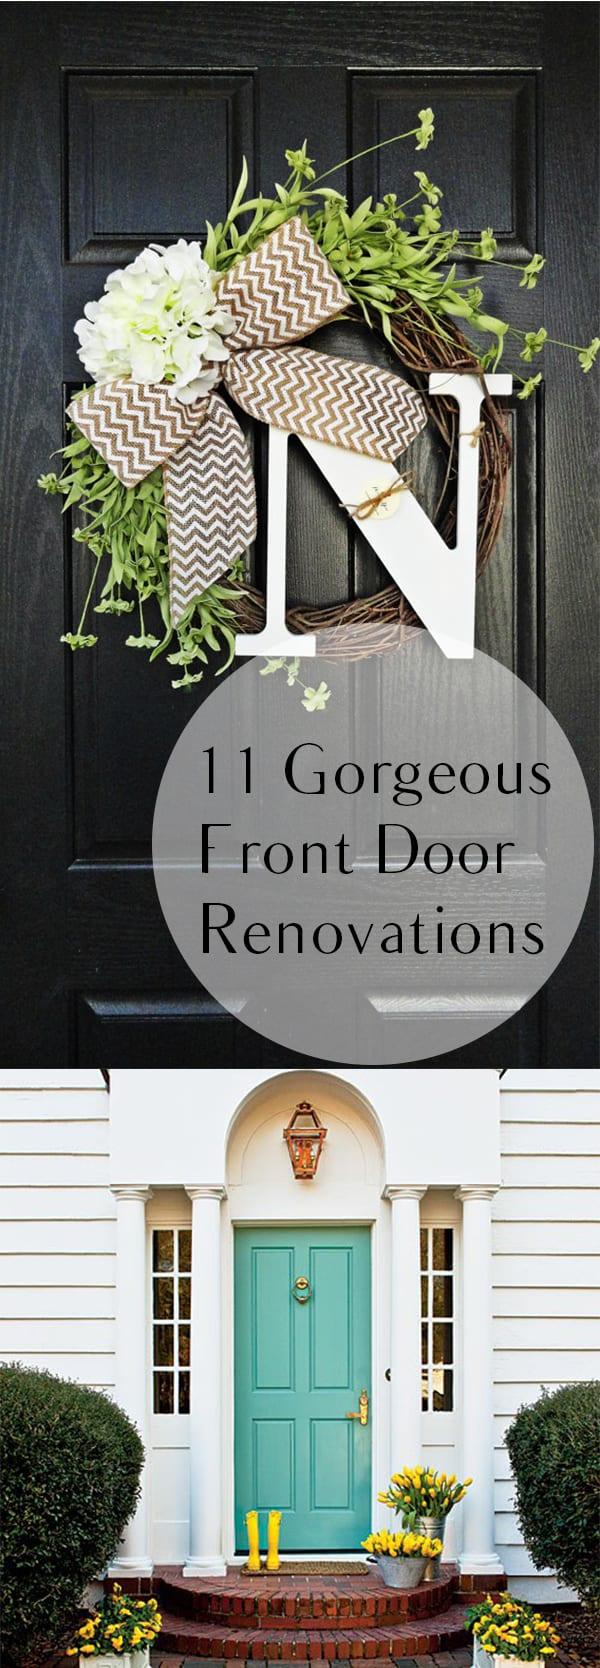 11 gorgeous front door renovations how to build it for Home door decoration ideas